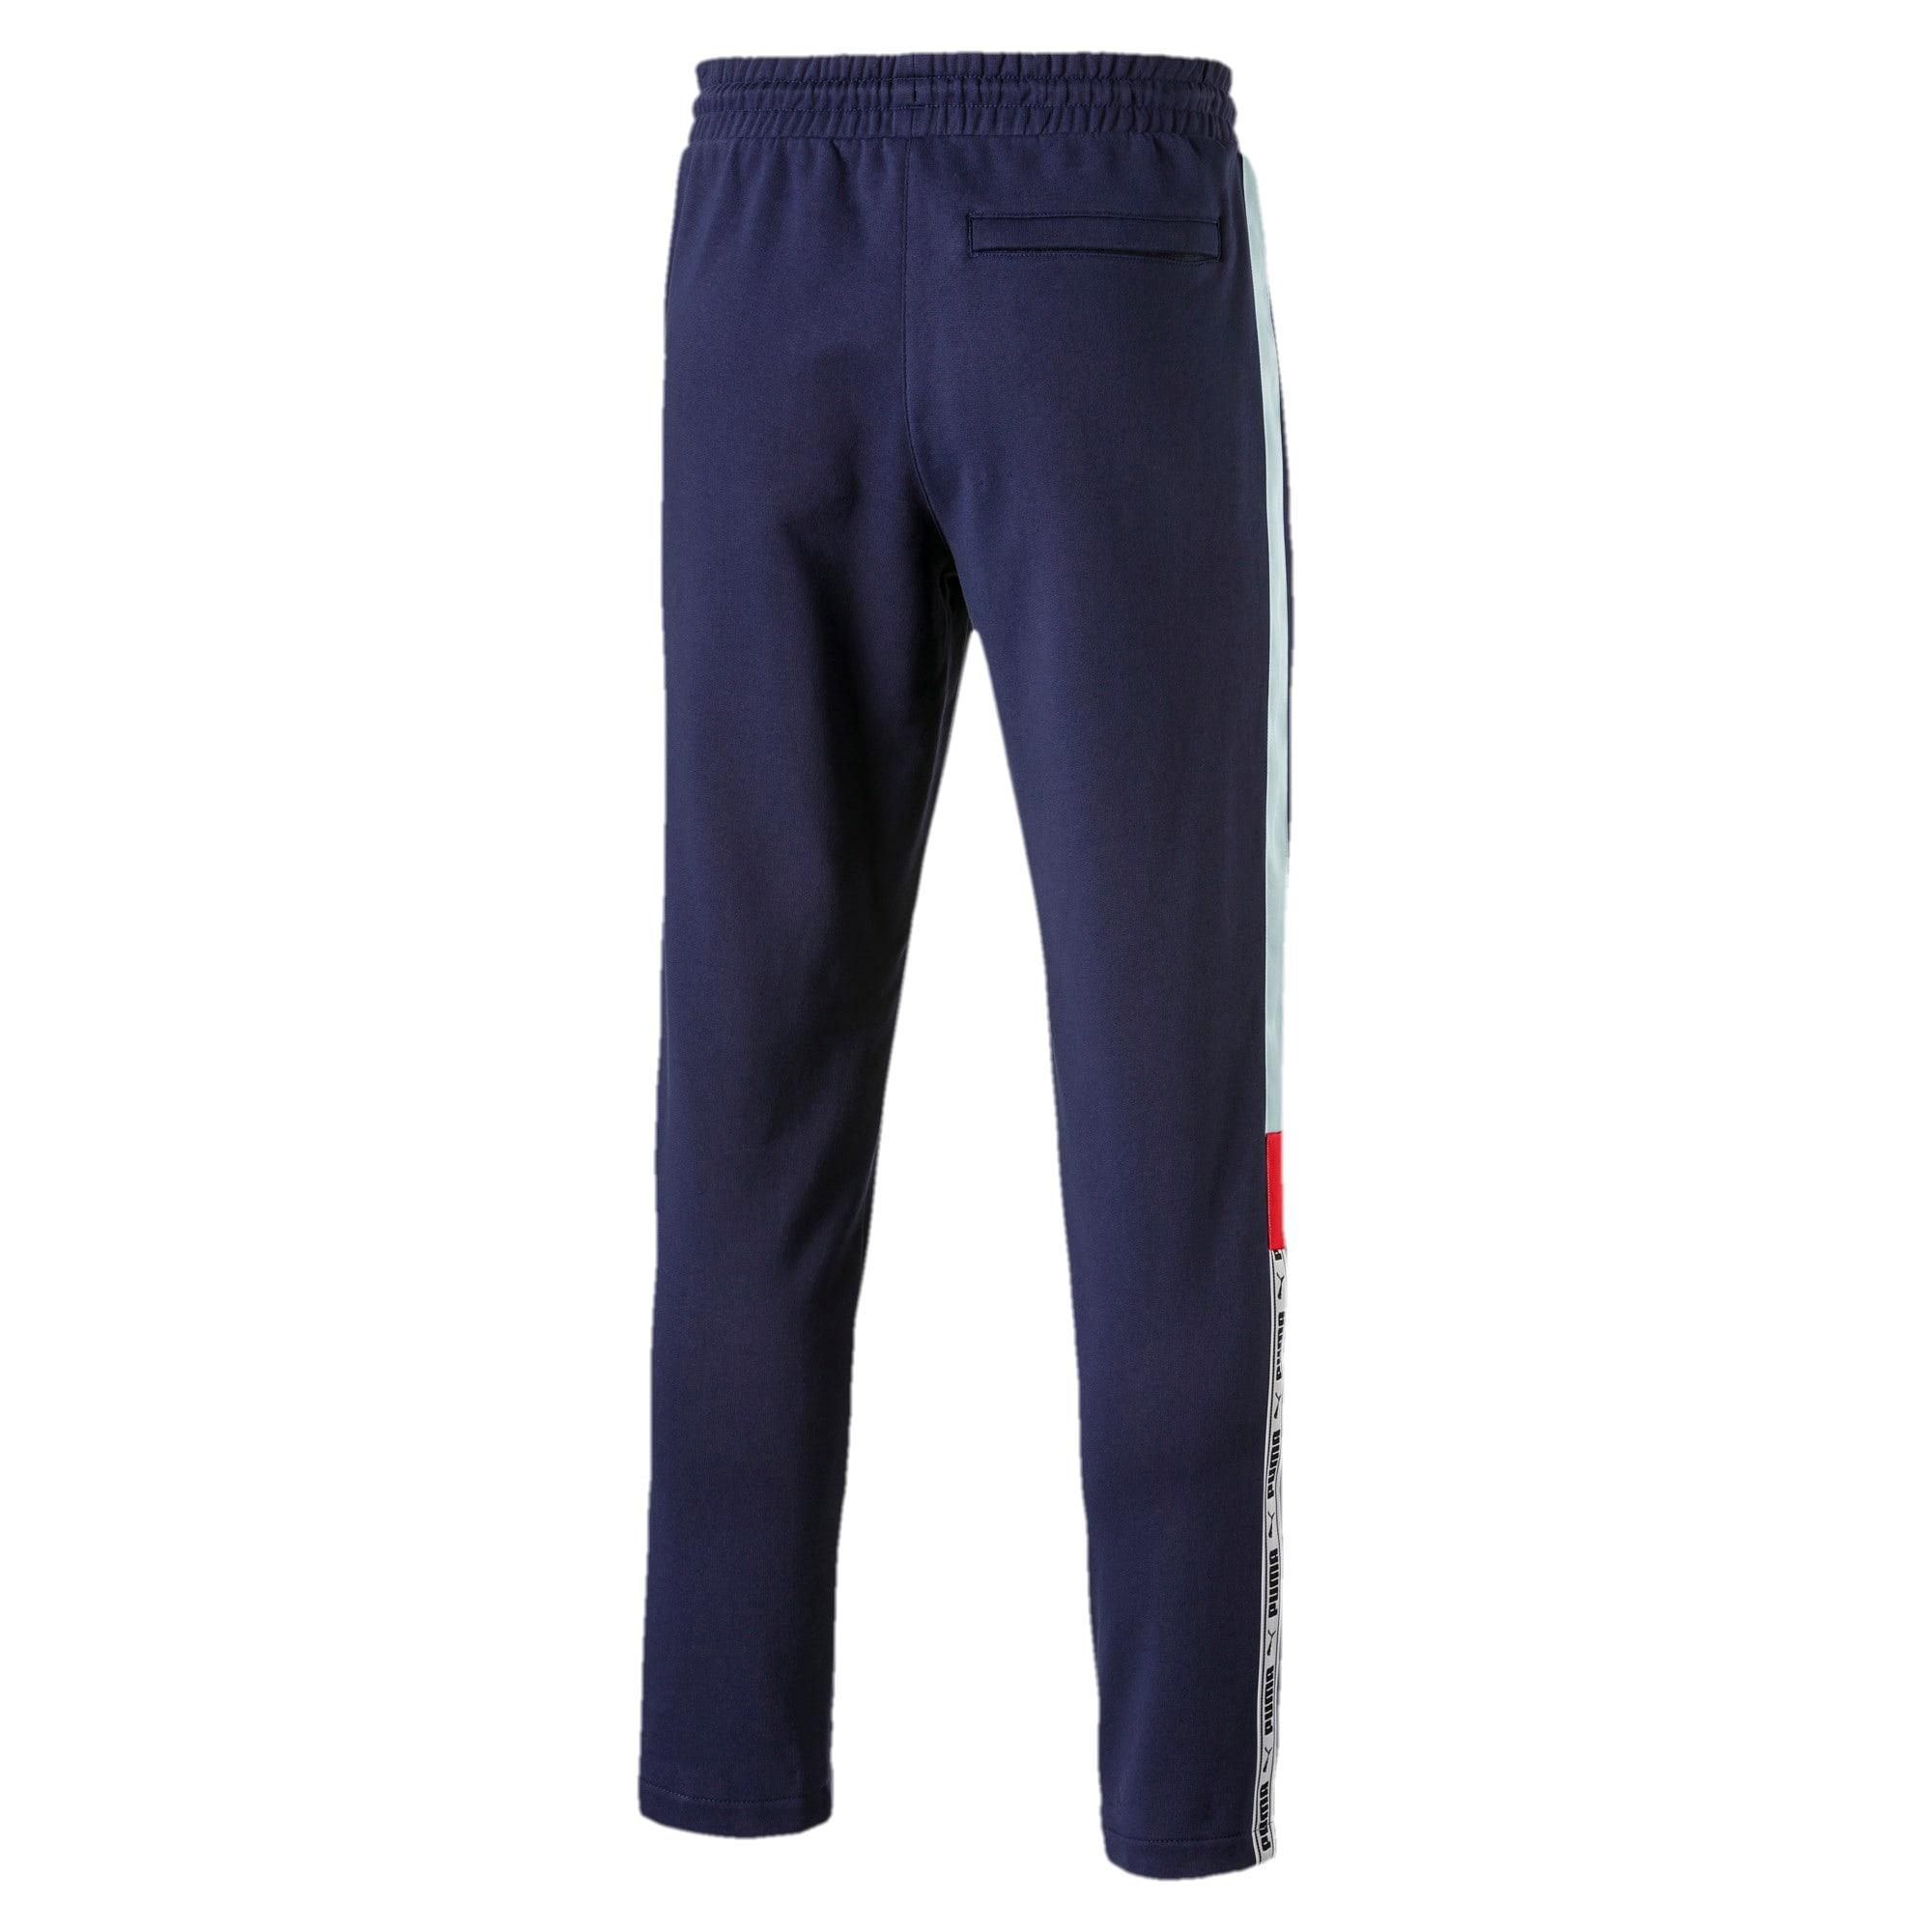 Thumbnail 5 of XTG Knitted Men's Sweatpants, Peacoat, medium-IND